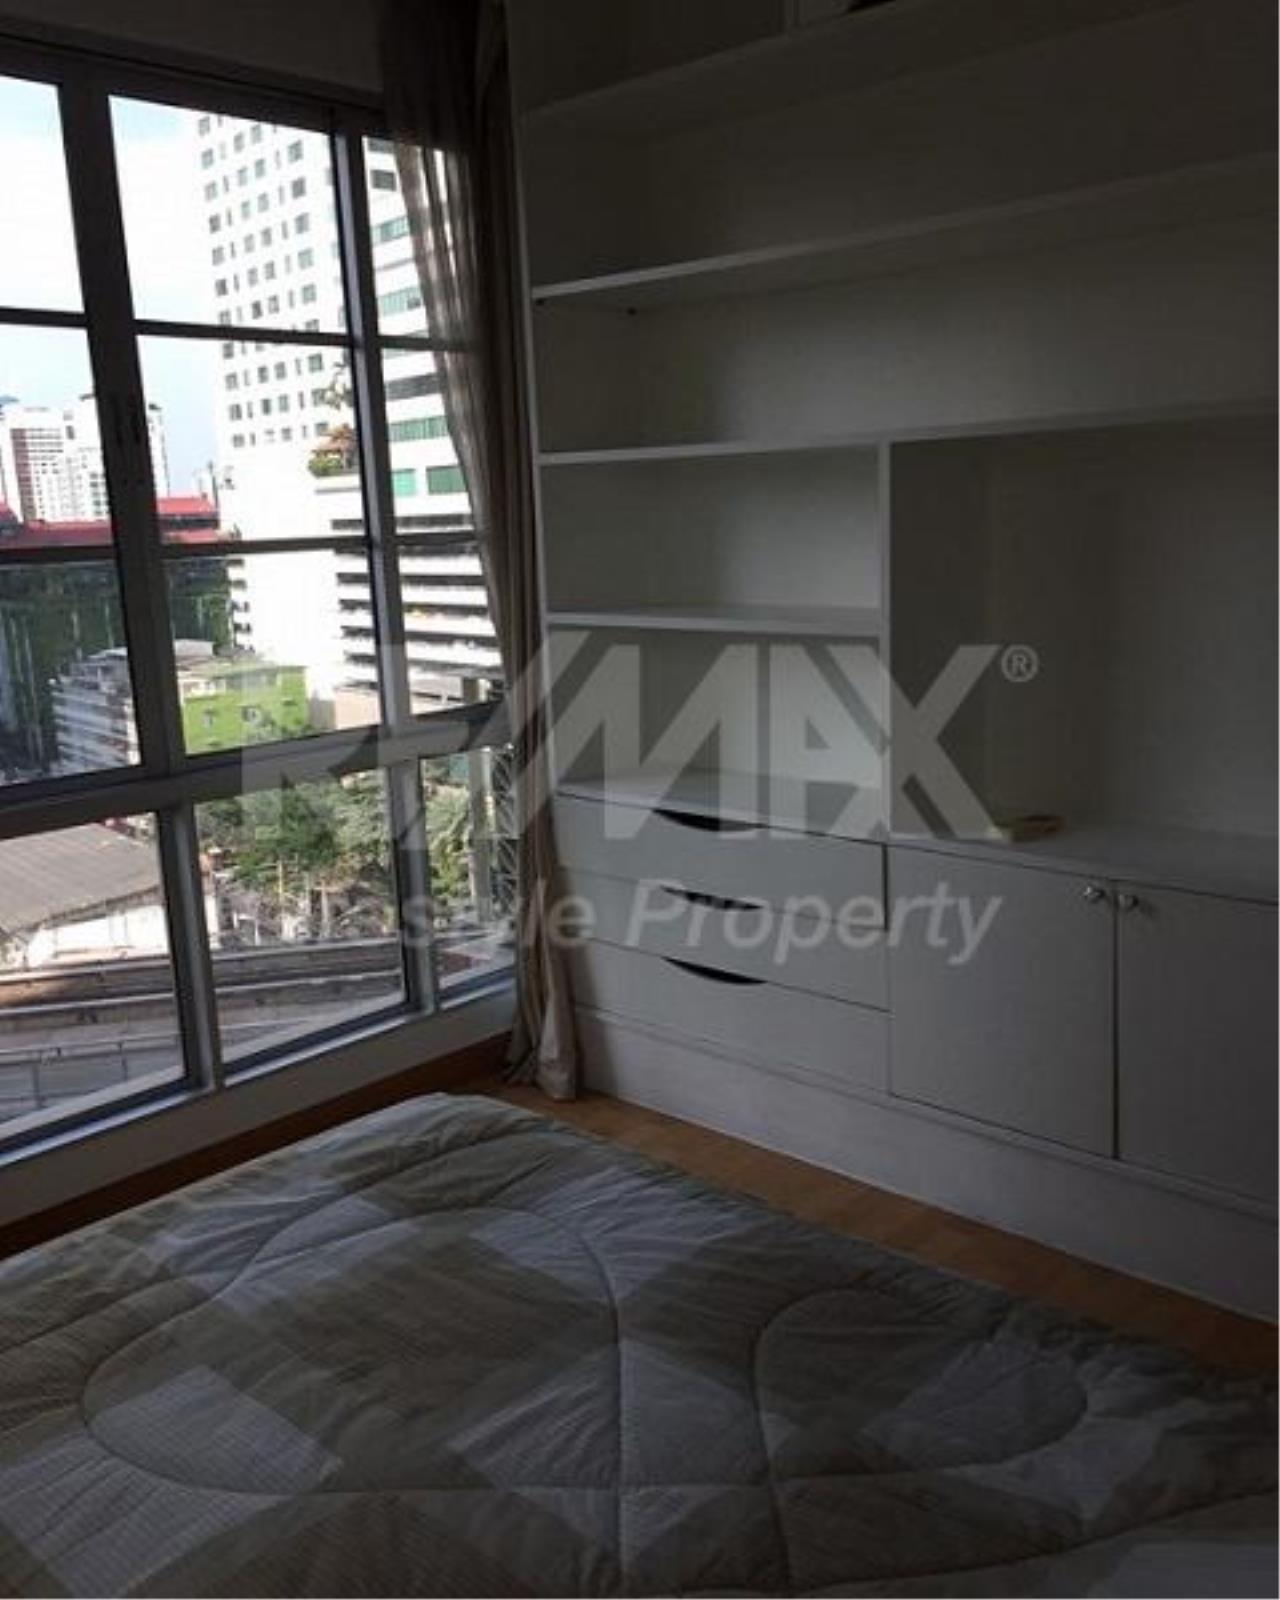 RE/MAX LifeStyle Property Agency's CitiSmart Sukhumvit 18 8